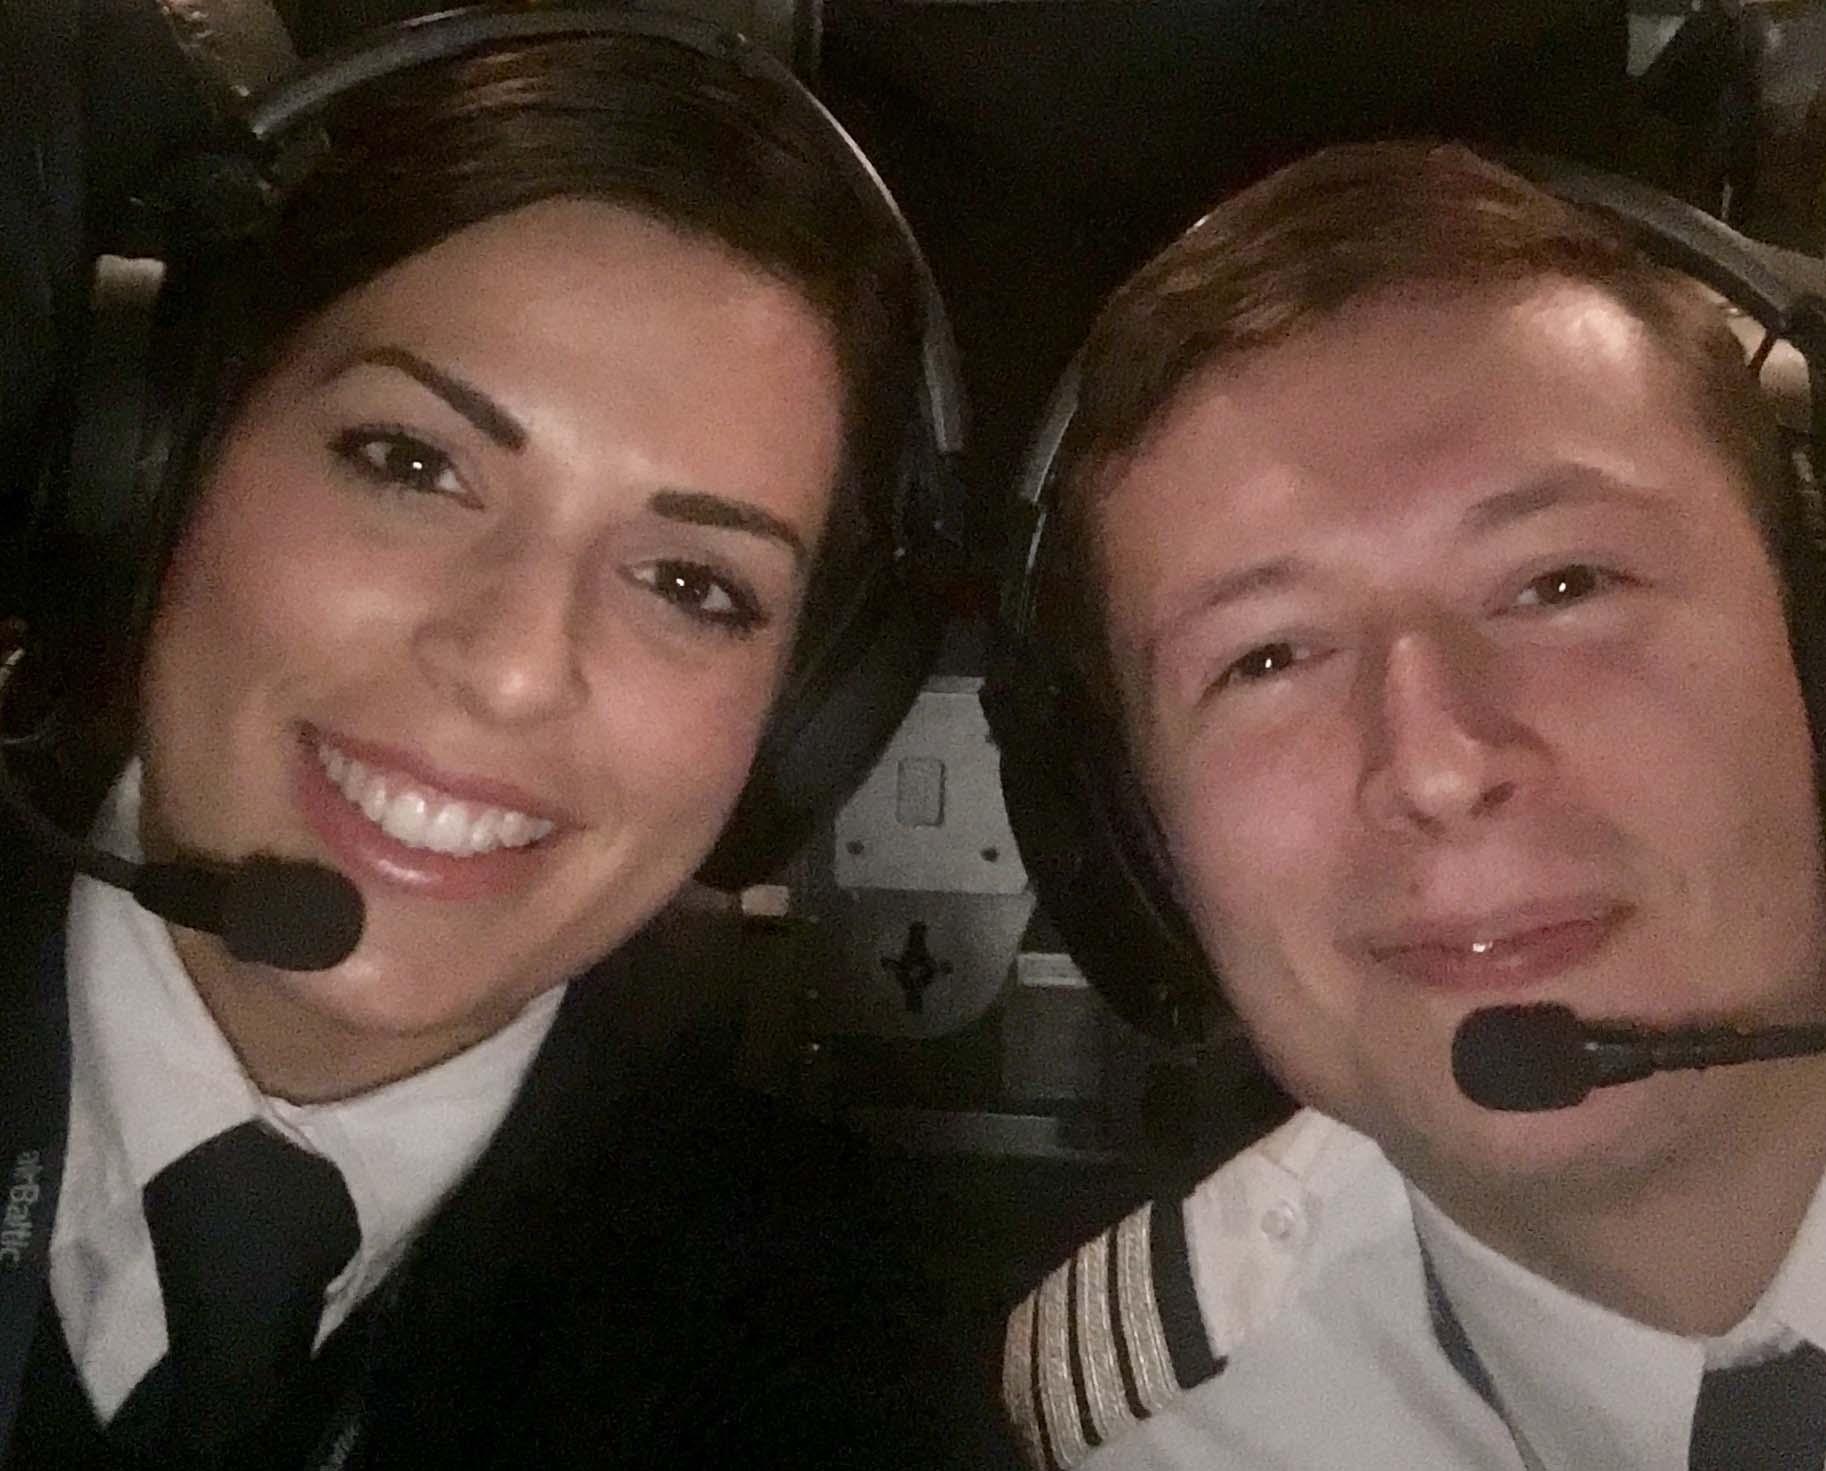 Ana-Female-Pilot-FTA-Group-Male-pilot-photo-5